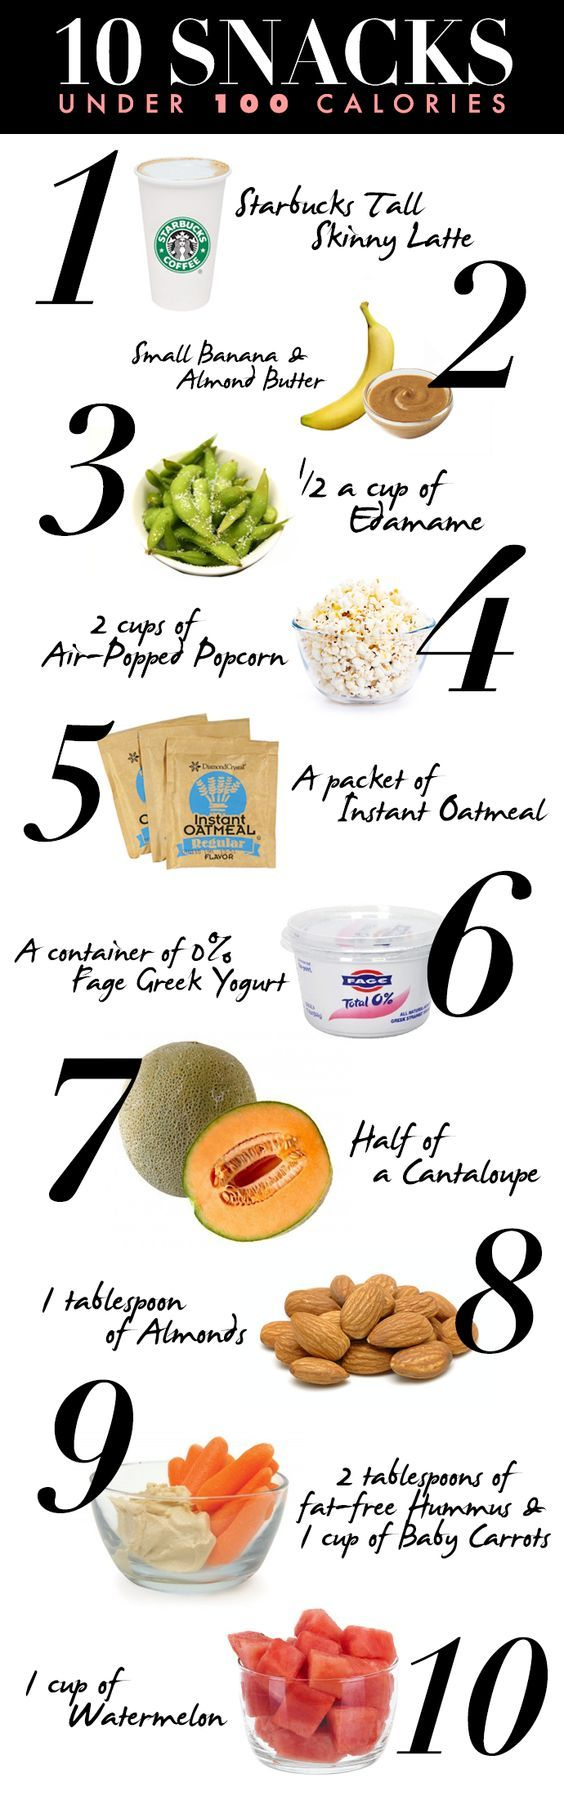 10 Snacks Under 100 Calories!